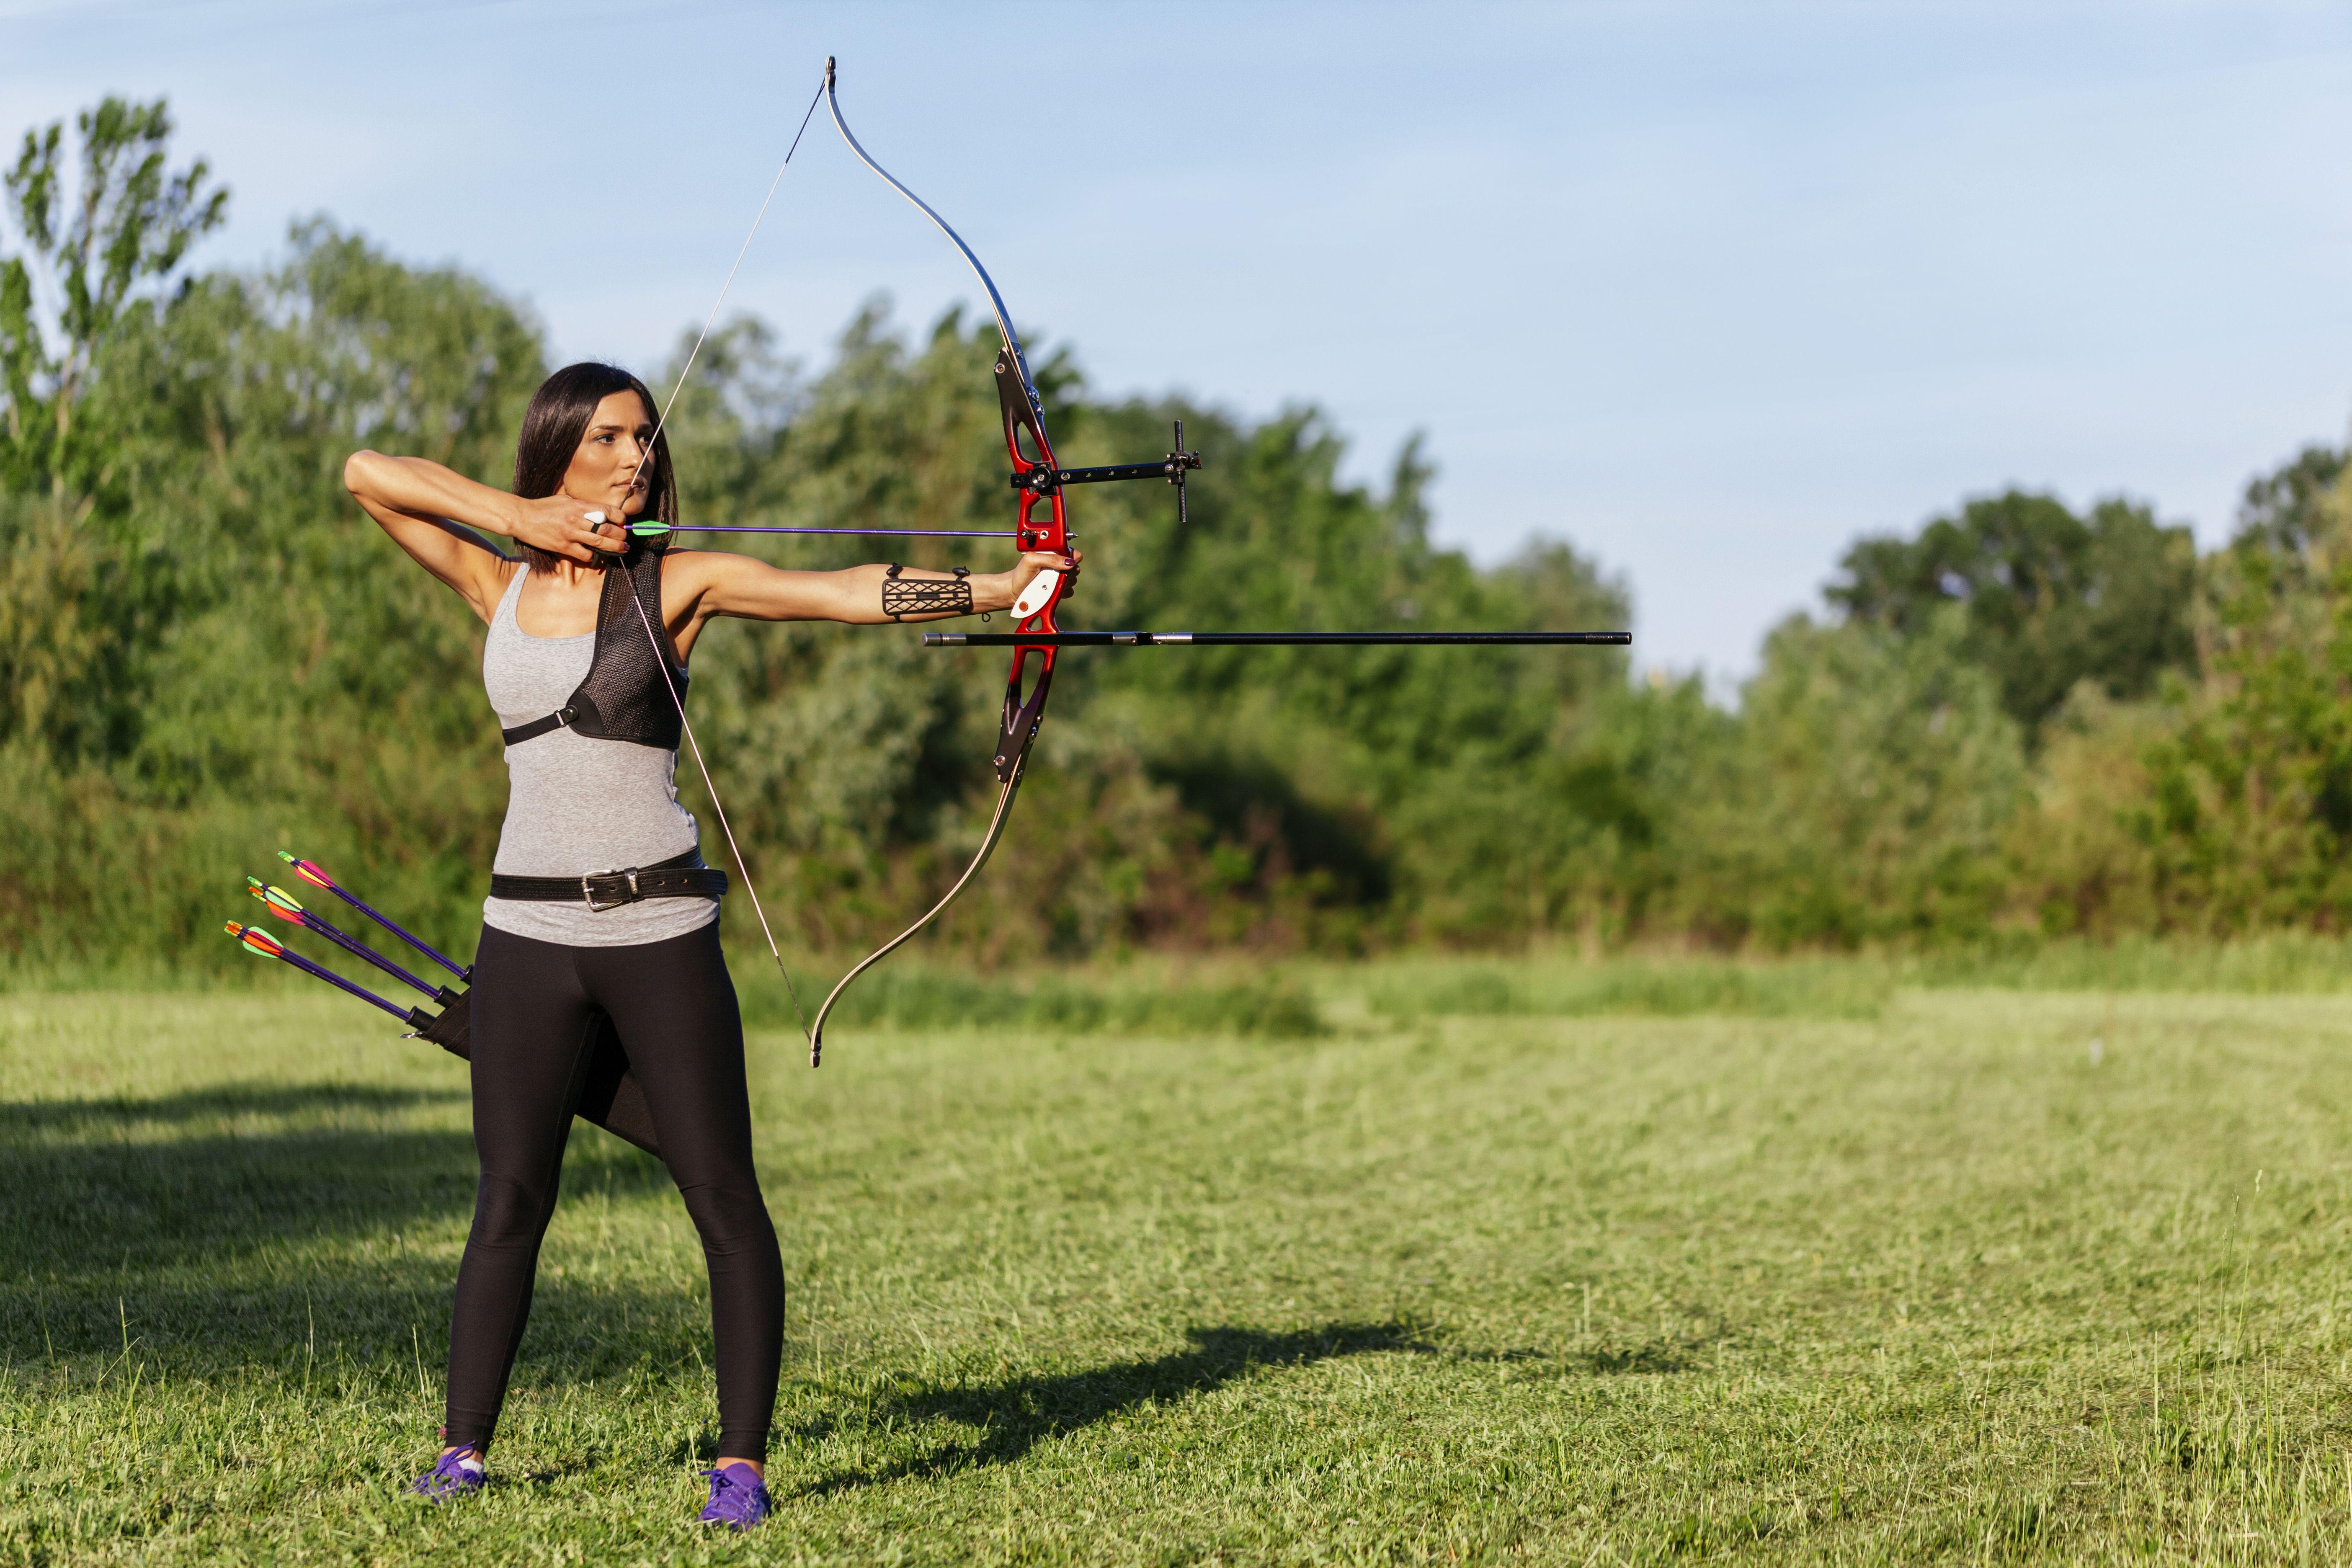 Archery nudes (53 photos), Topless, Hot, Twitter, bra 2017